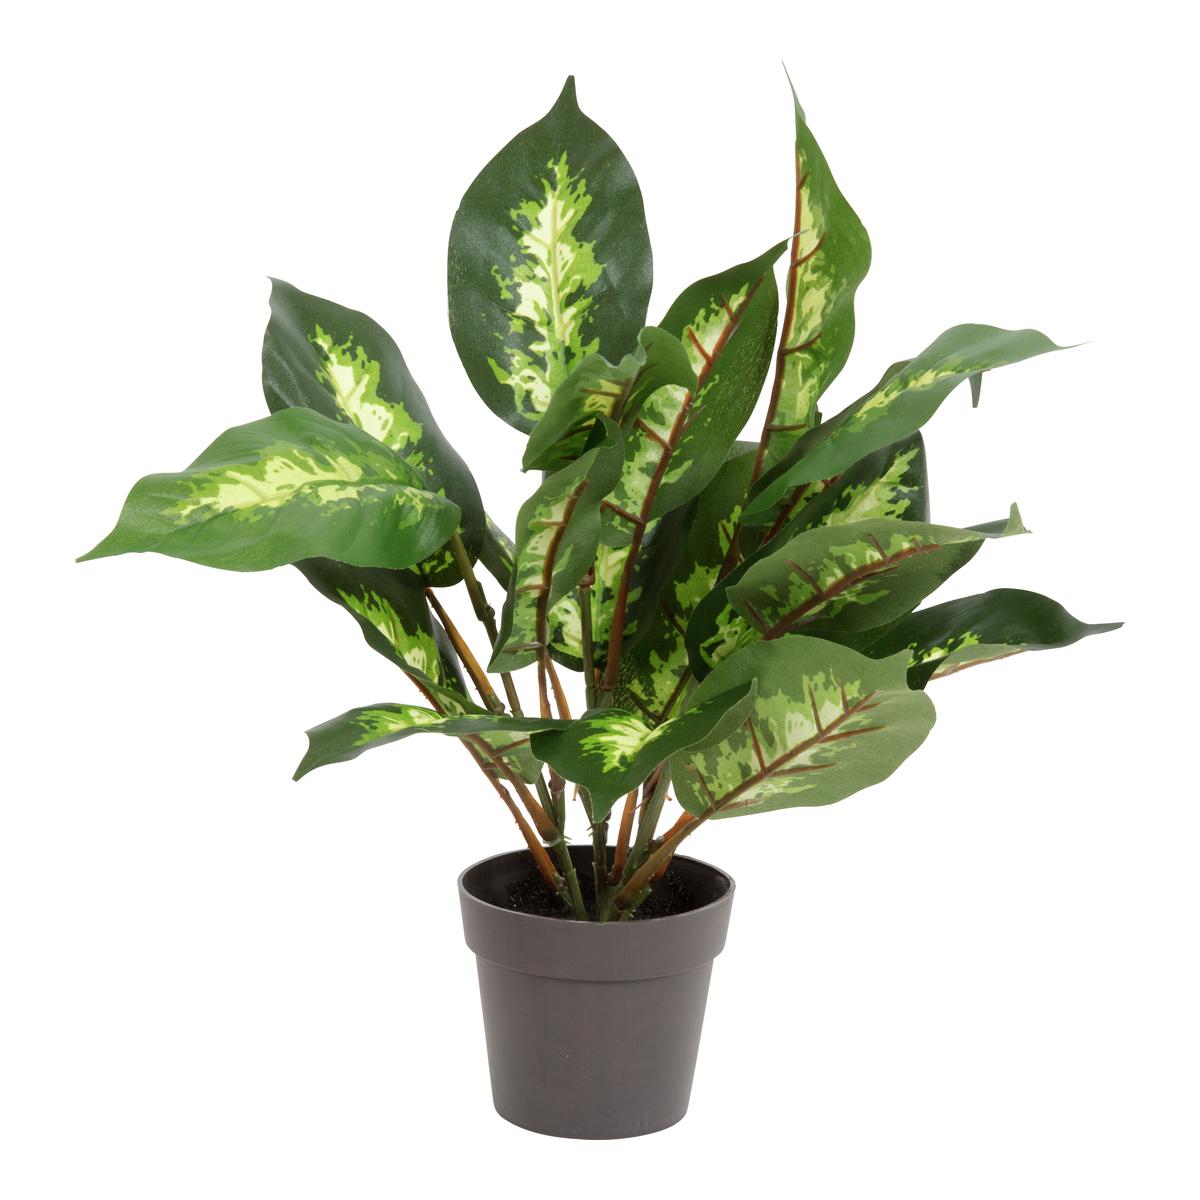 Grønn plante i potte-BLO1995